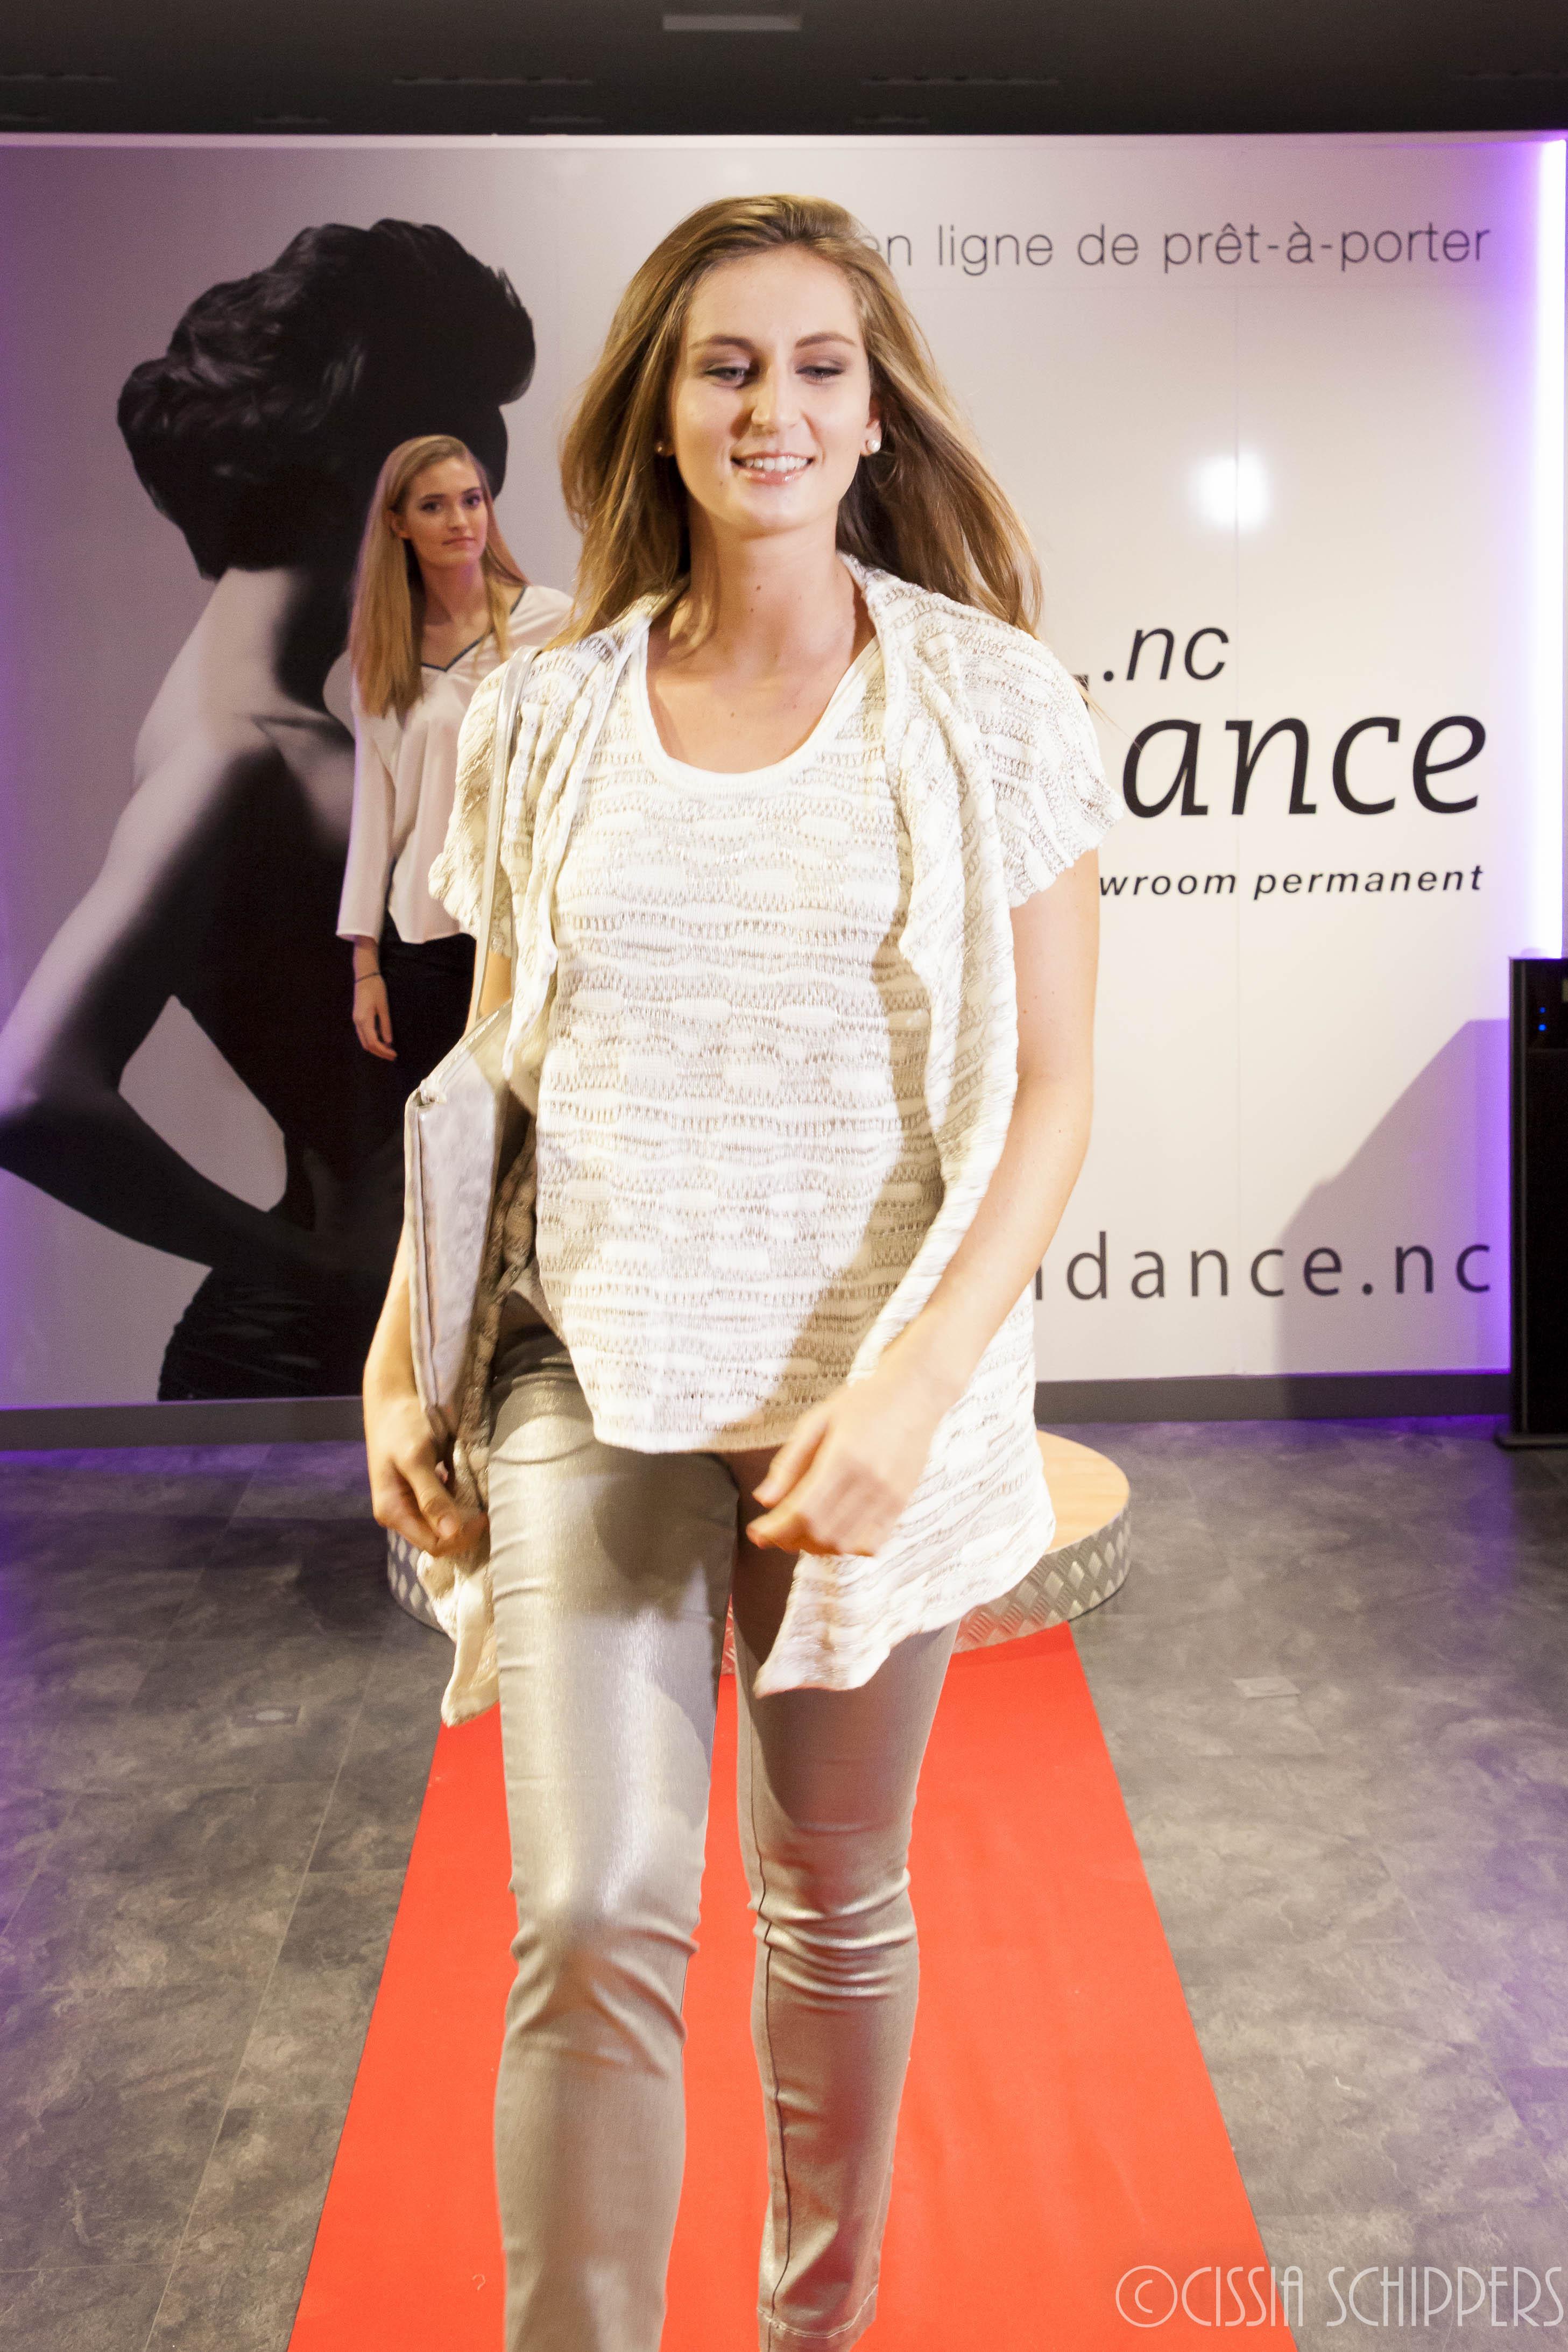 Tendance NC 2017 by Cissia Schippers photographe-7881